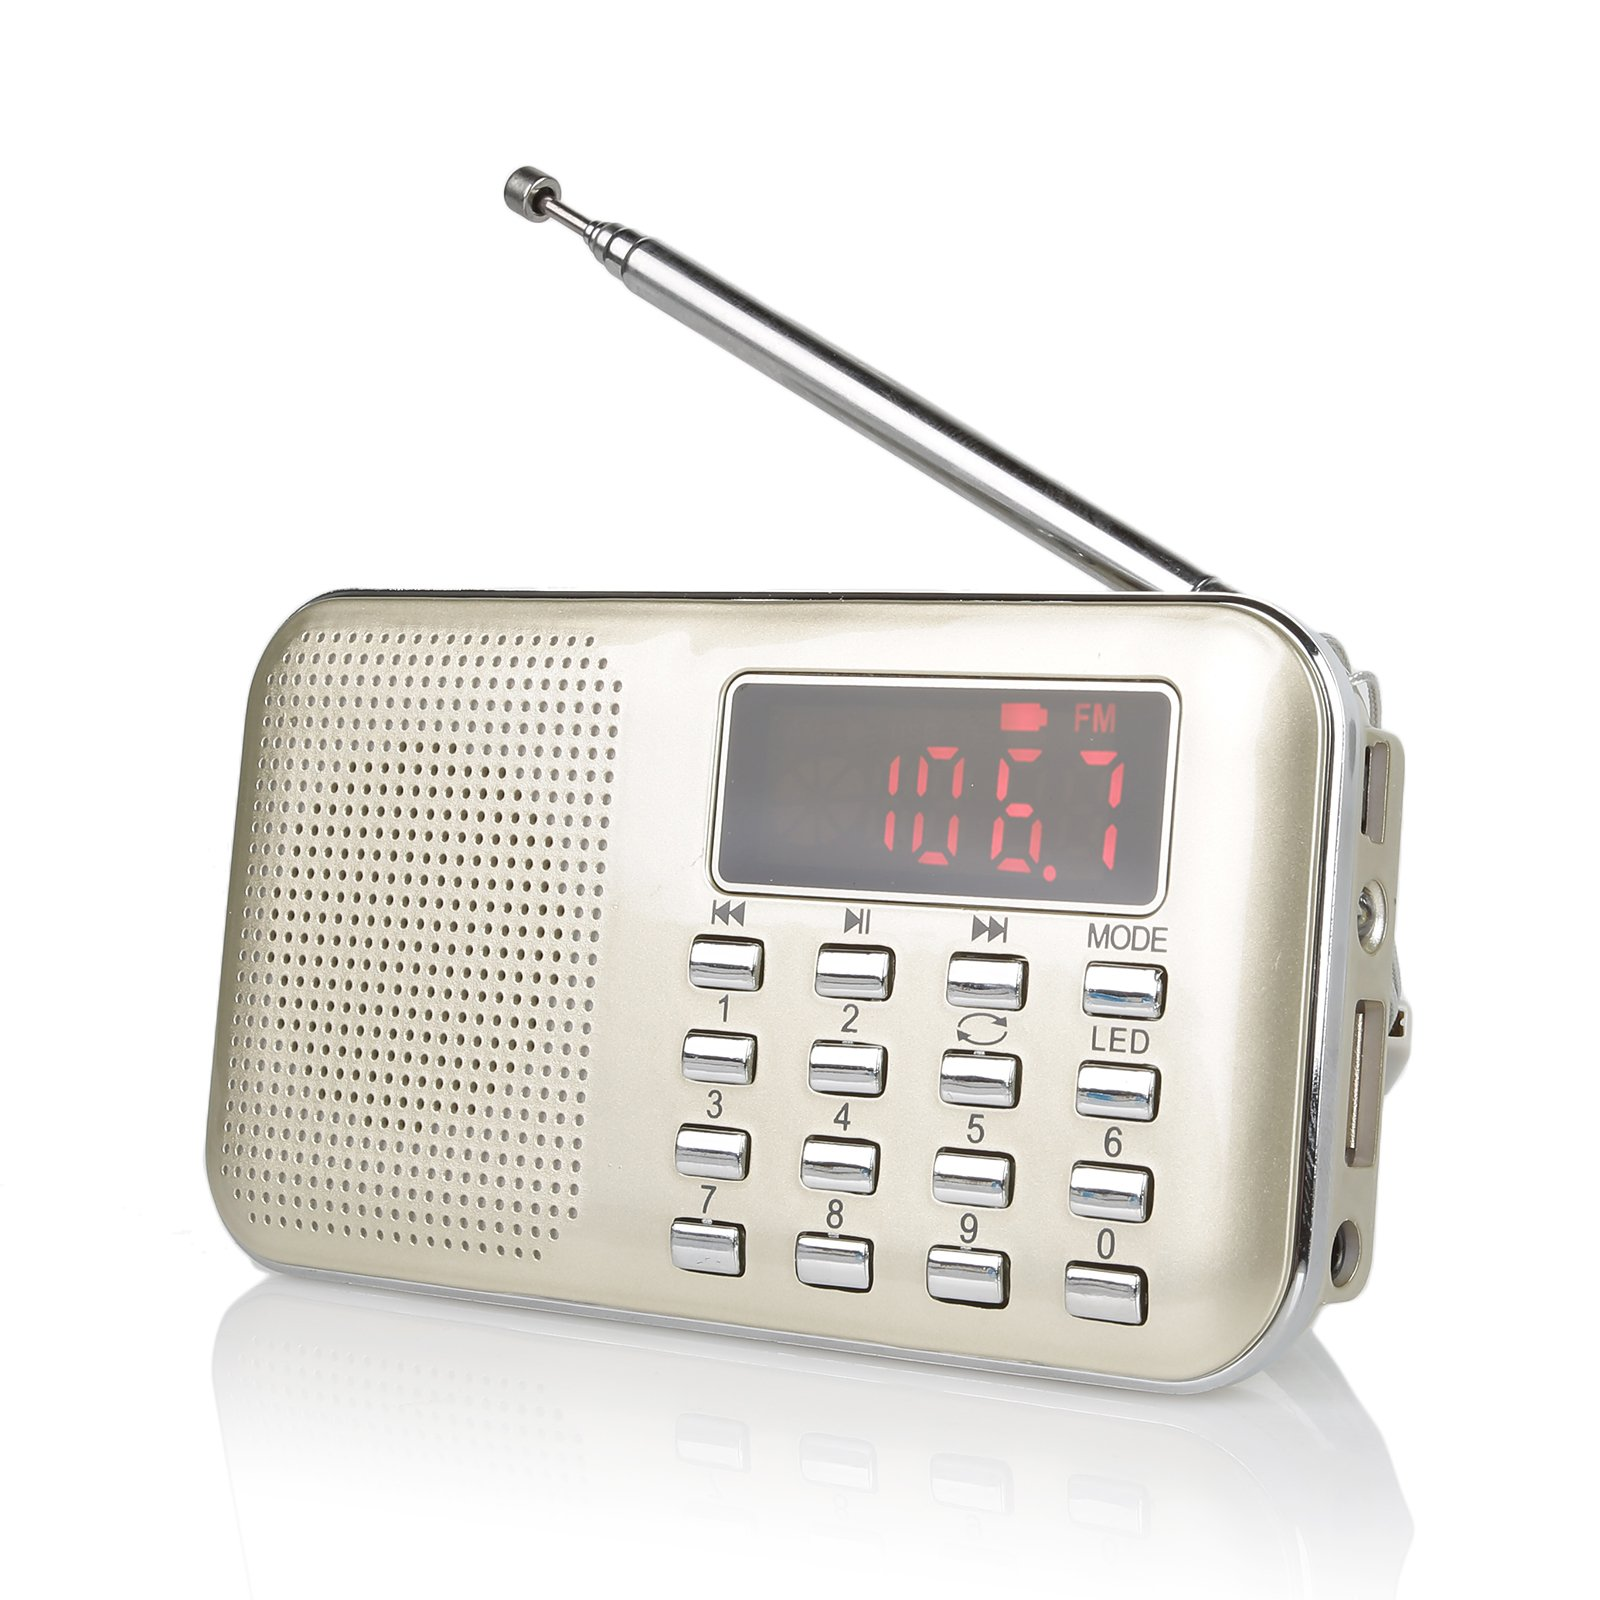 Radioddity RF23 Portable AM/FM Transistor Radio MP3 Music Player, Light and Ultra Thin, Support Micro TF Card USB, Flash Light (Gold)